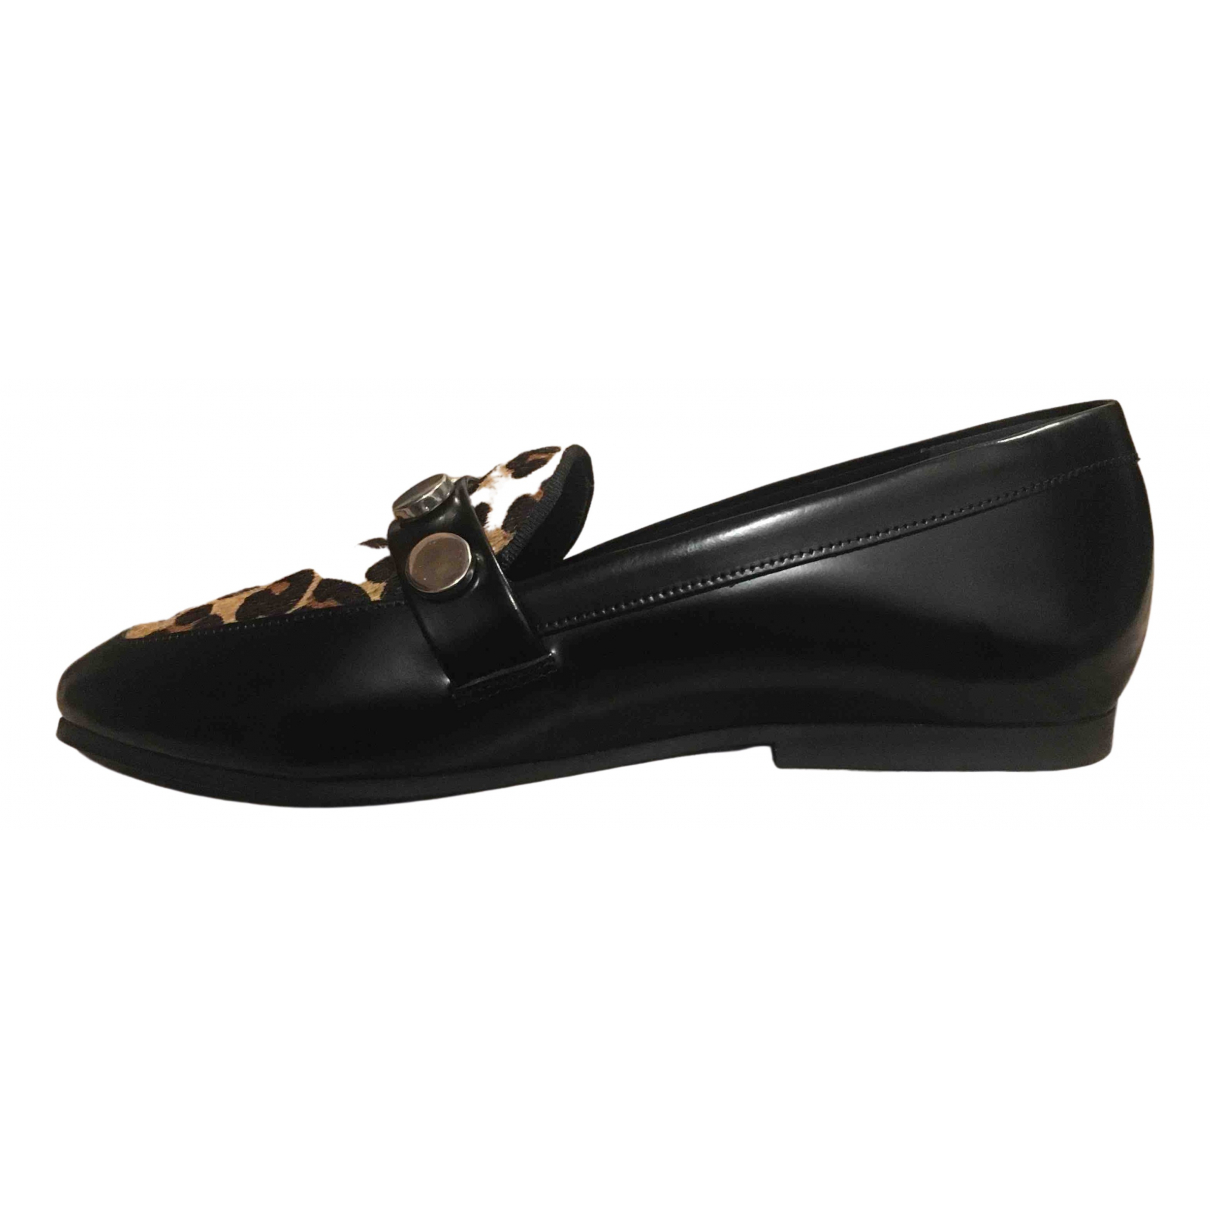 Claudie Pierlot \N Black Leather Flats for Women 36 EU